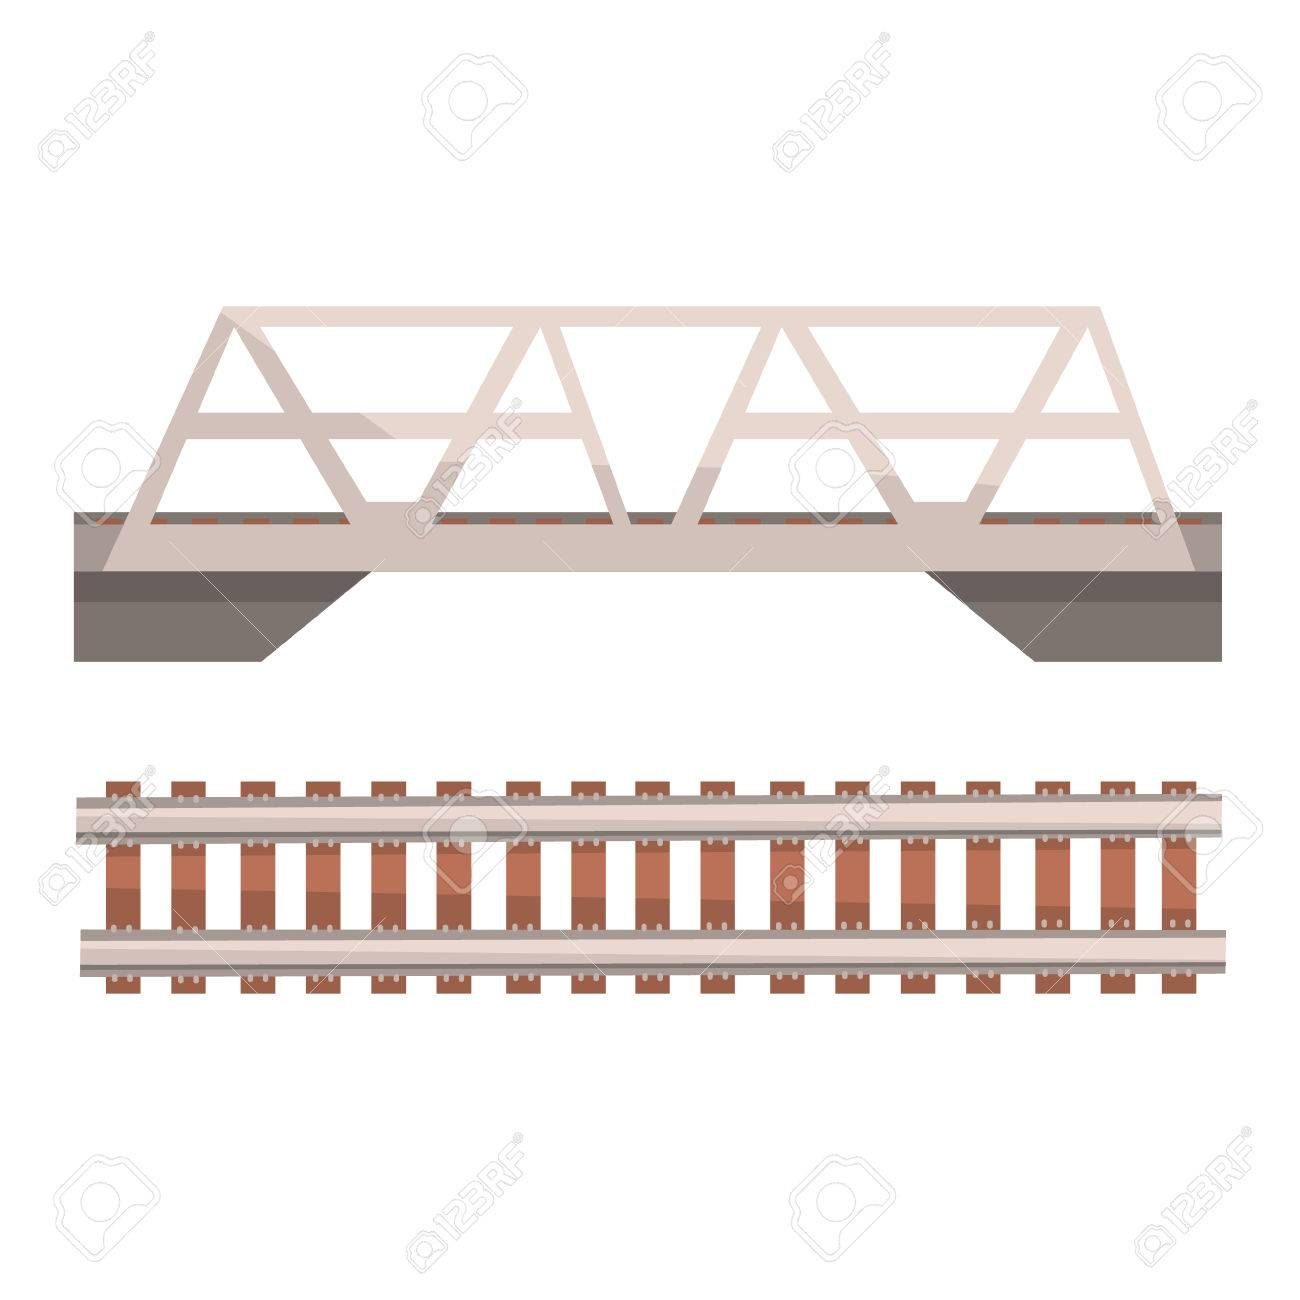 Railway bridge and railroad, rail section. Colorful cartoon illustration - 78290275